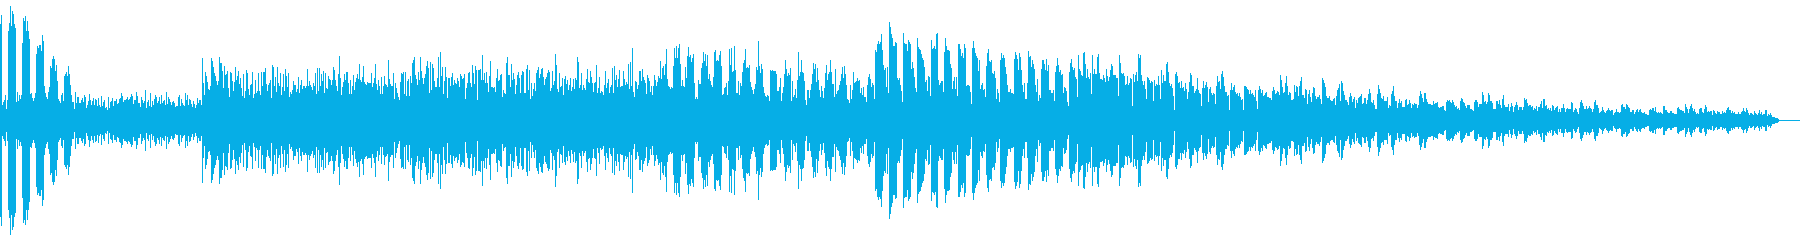 AMGアナログFX 25の再生済みの波形